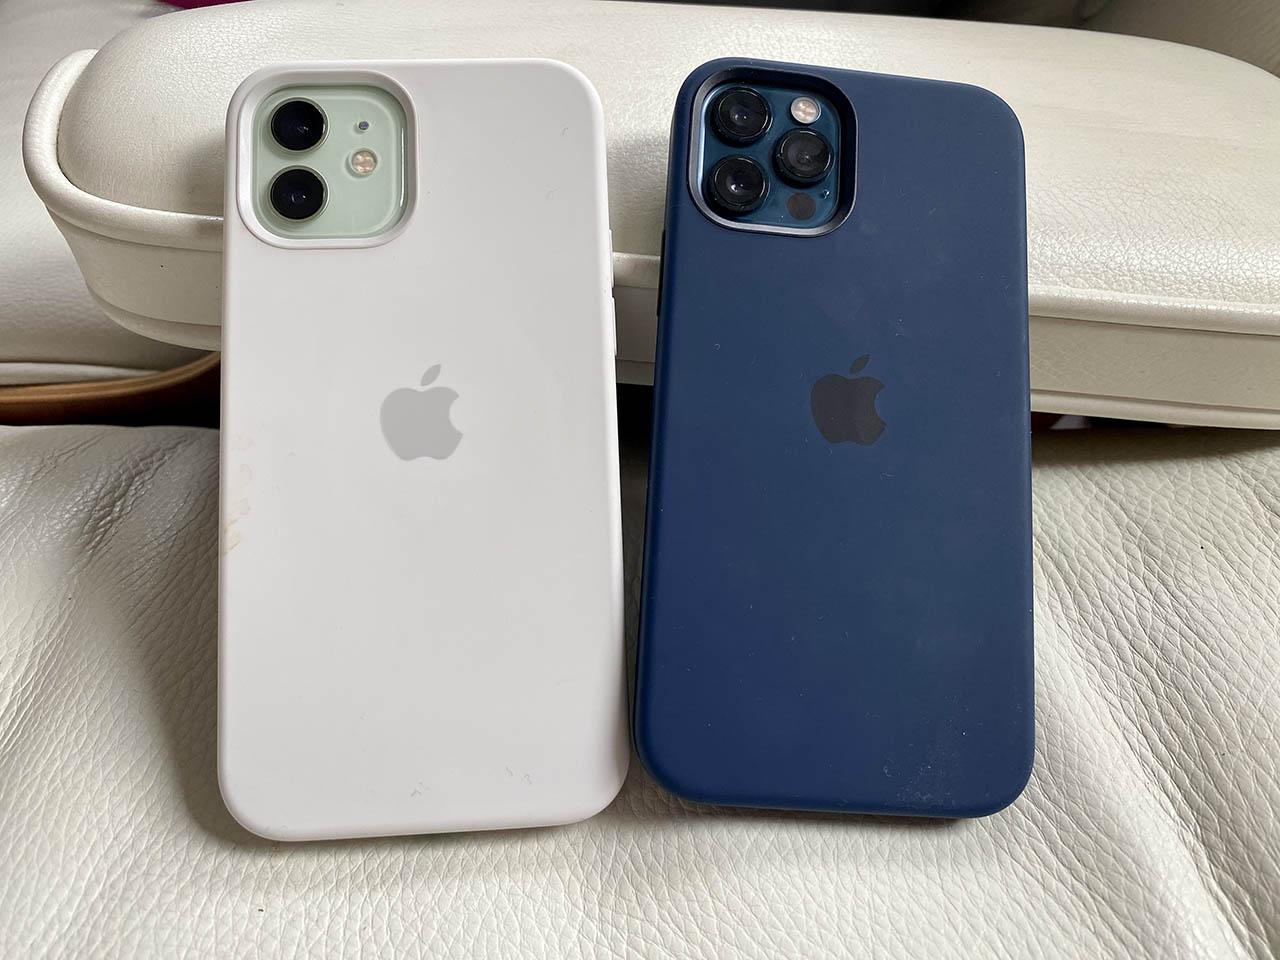 Apple siliconenhoes voor iPhone 12